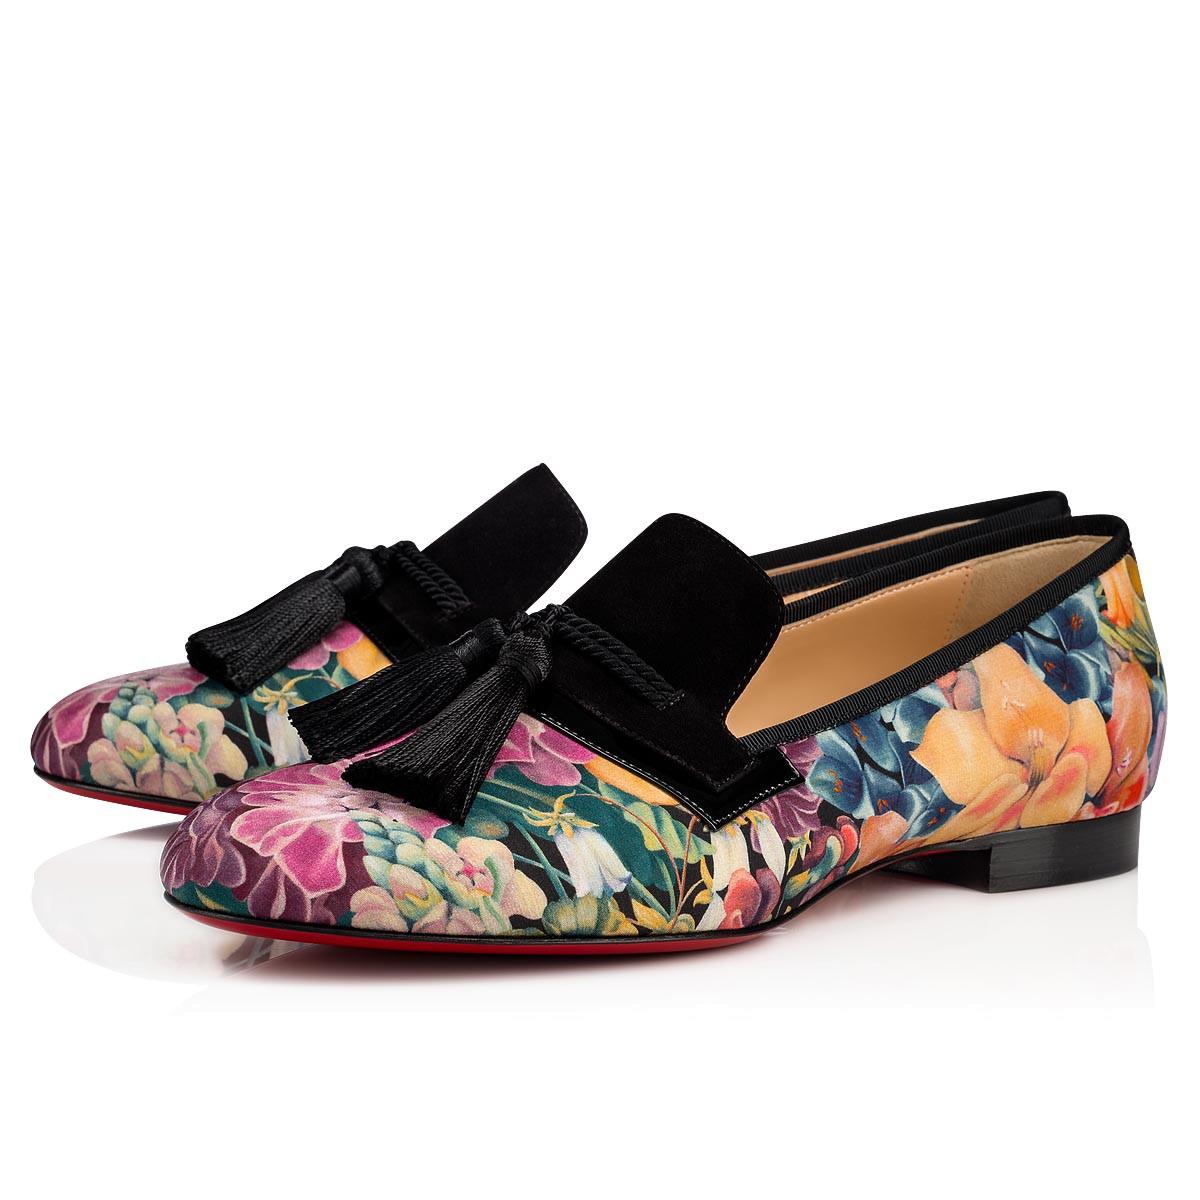 Scarpe basse a fiori Christian Louboutin a 645 euro